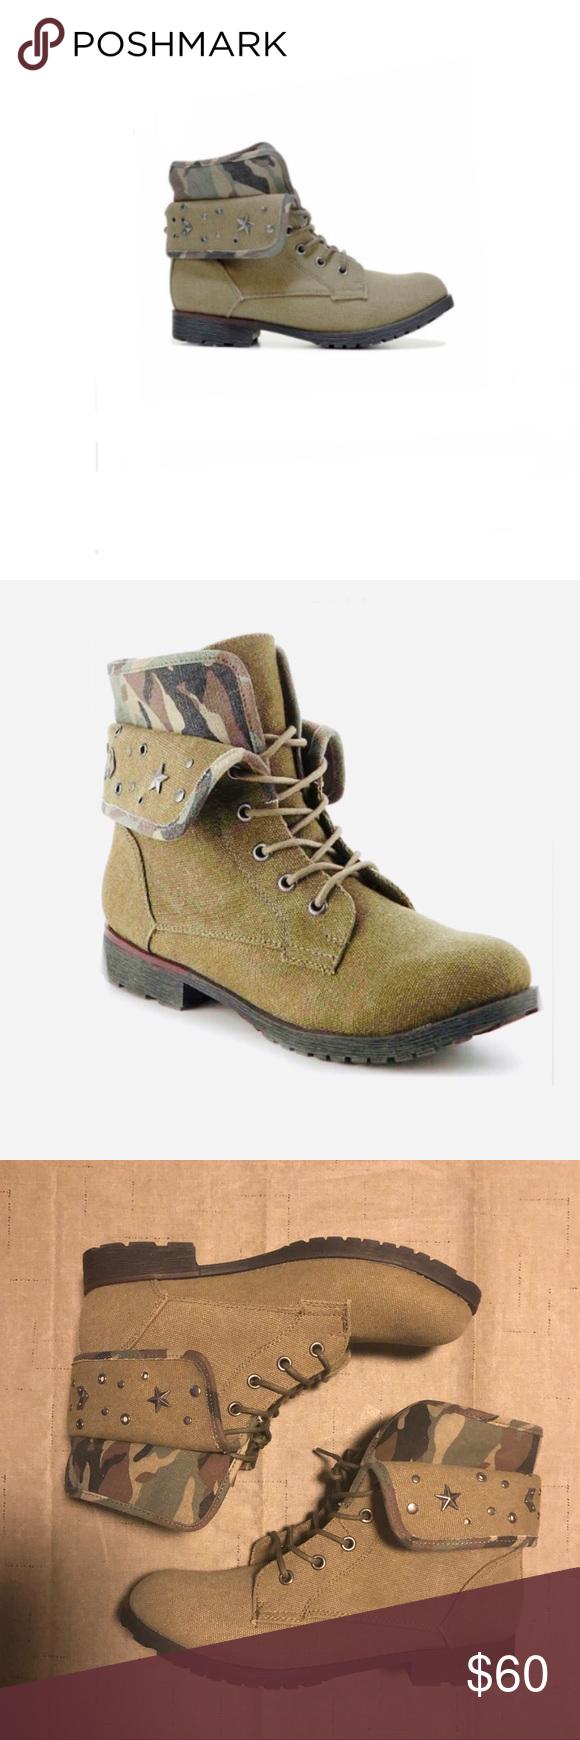 e7350f0d529 ZIGI Rock & Candy Spraypaint Boots-9.5 NWT ZIGI Rock & Candy ...